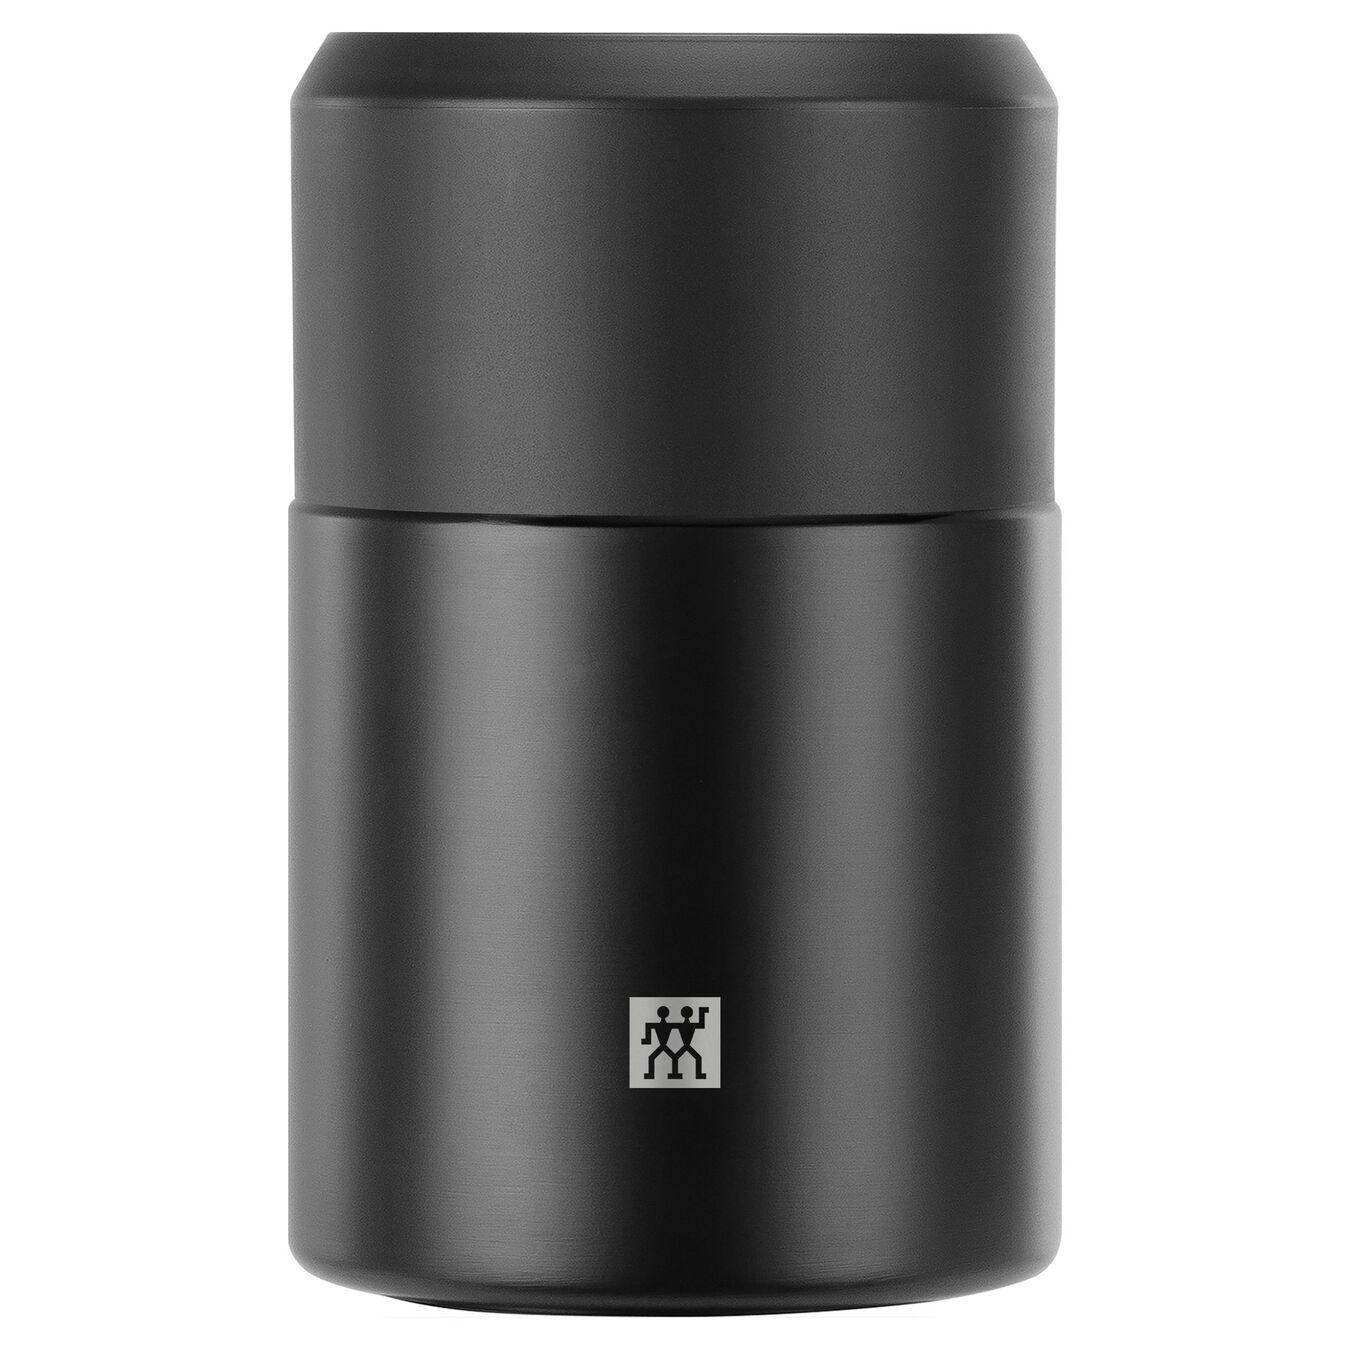 Recipiente alimentare - 700 ml, acciaio inox, nero,,large 1